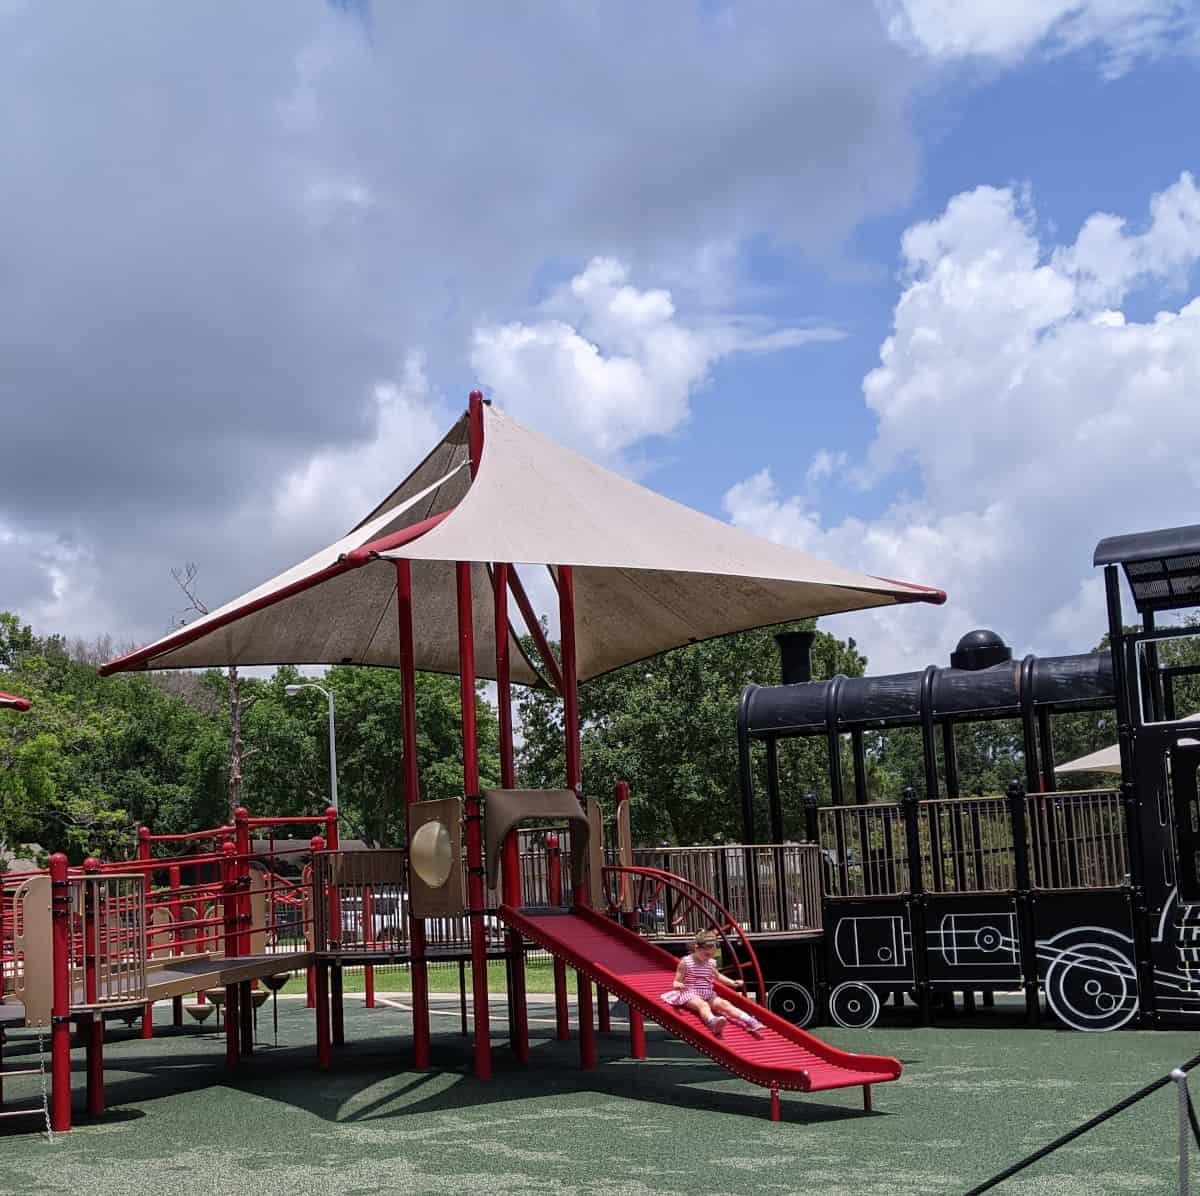 Katy Play Station Roller Slide